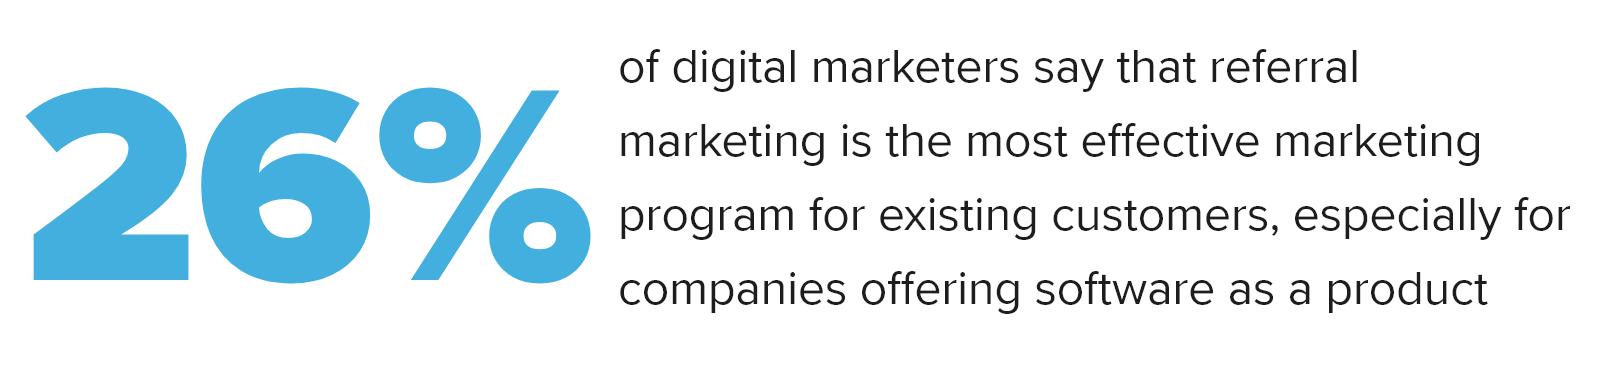 referral marketing statistics